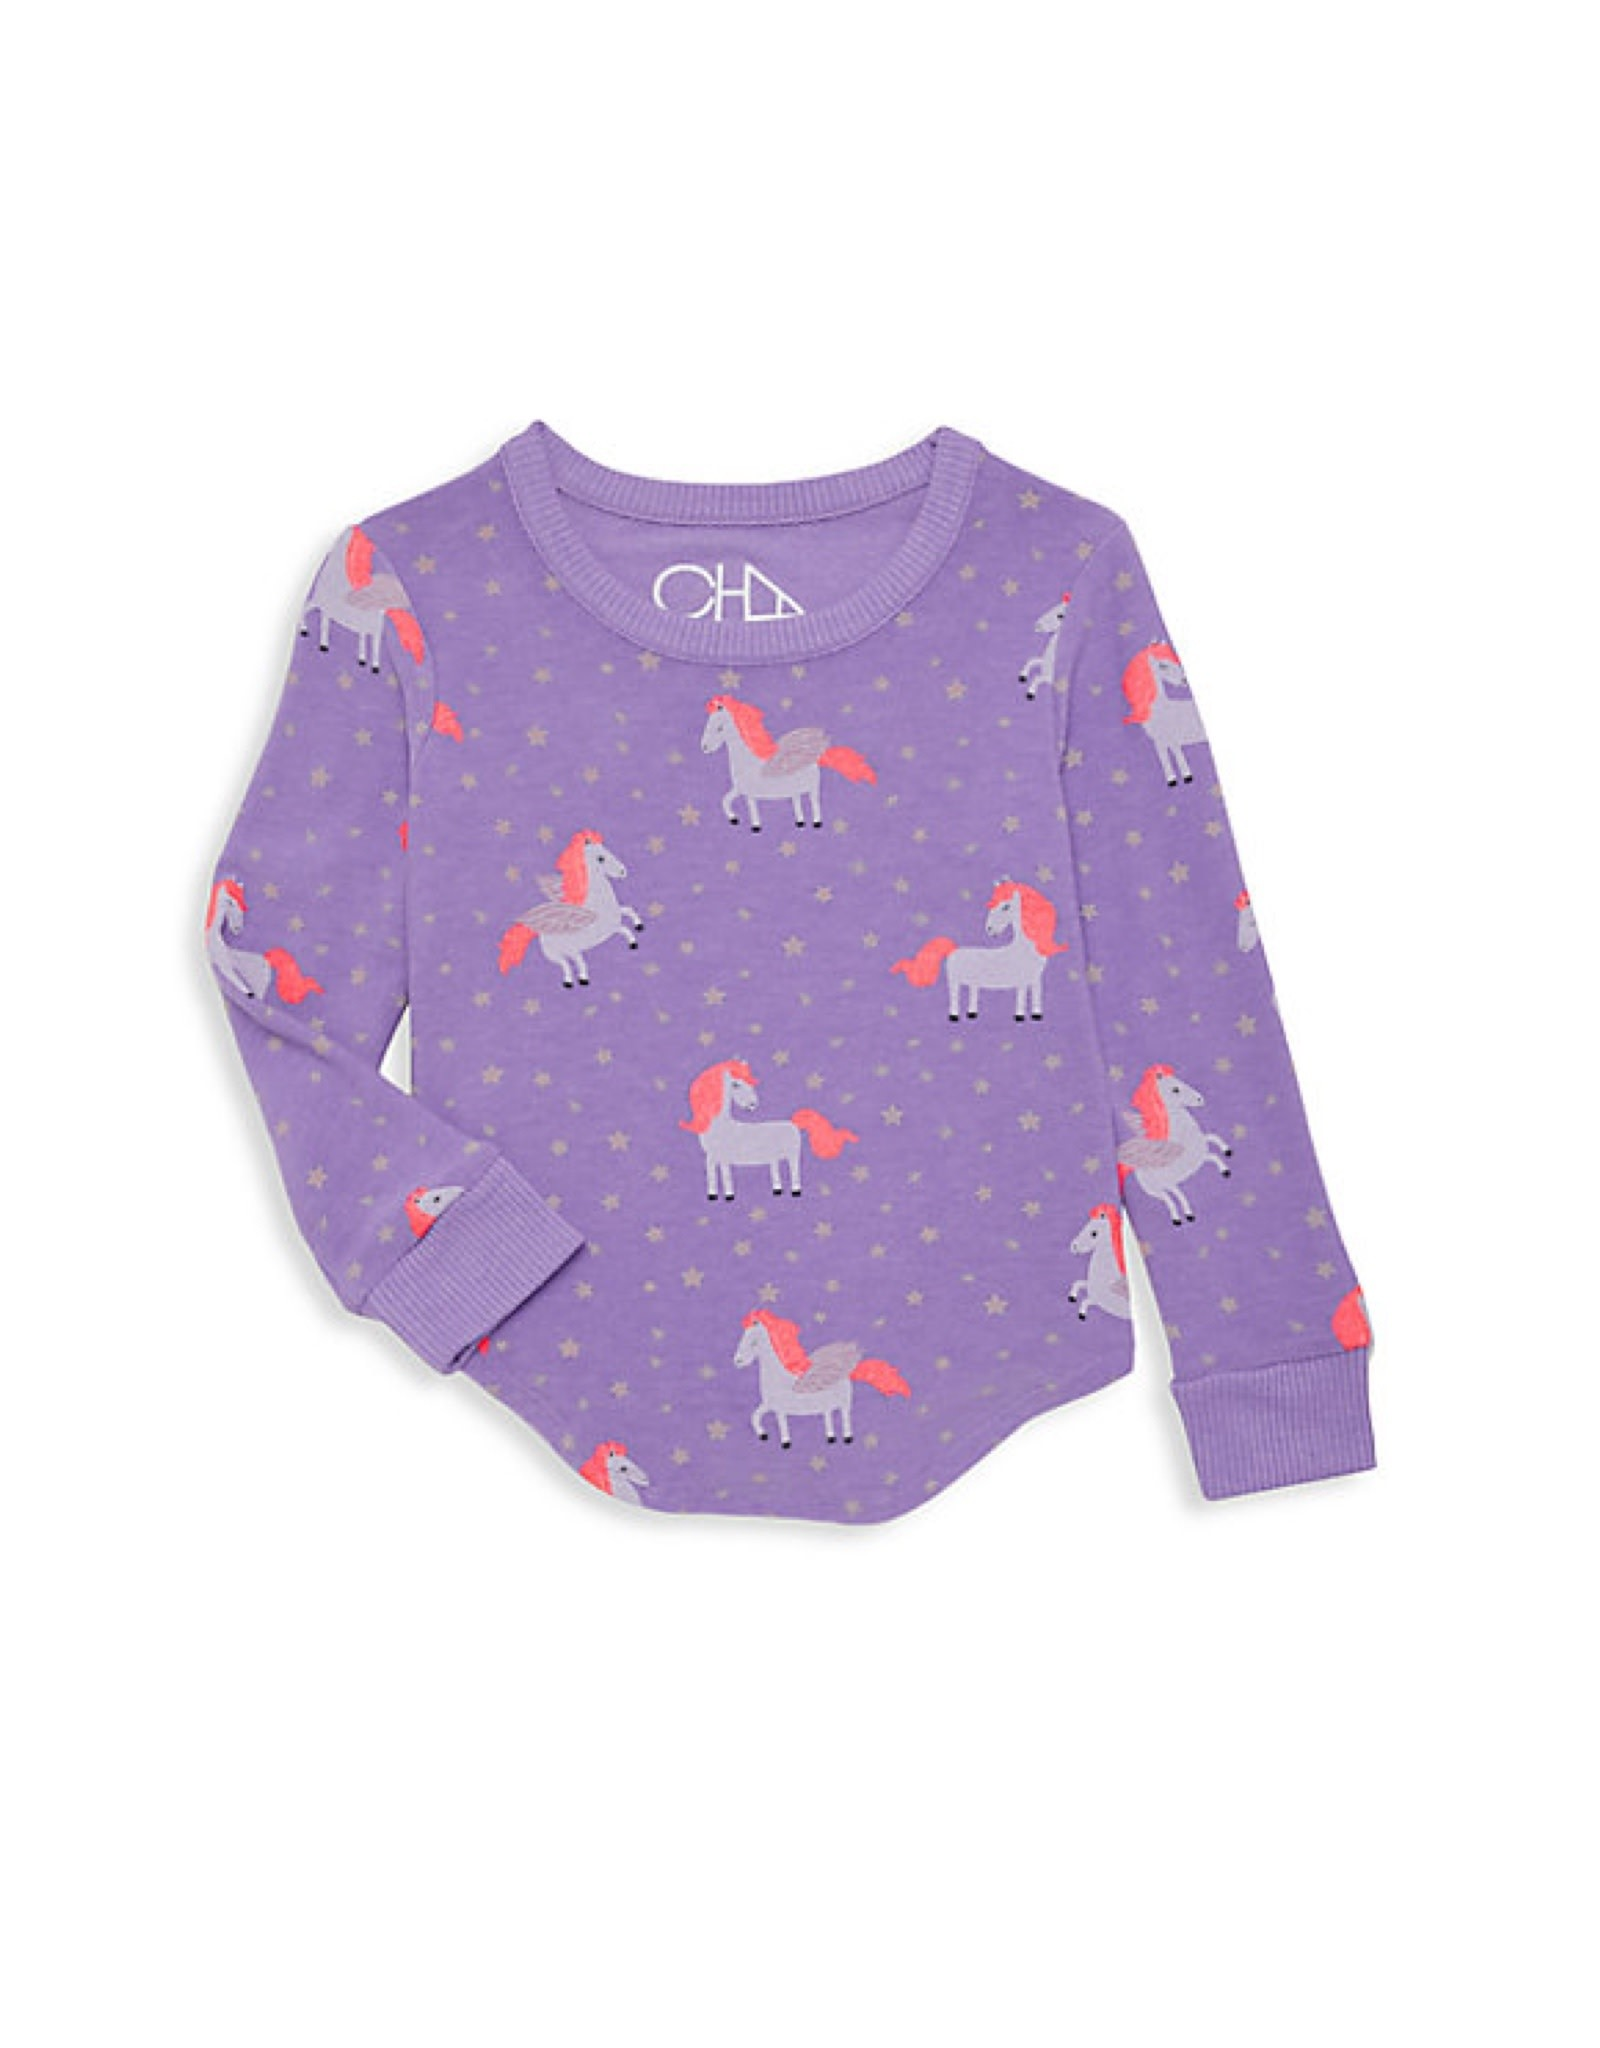 Chaser Brand Unicorn Dream Pullover